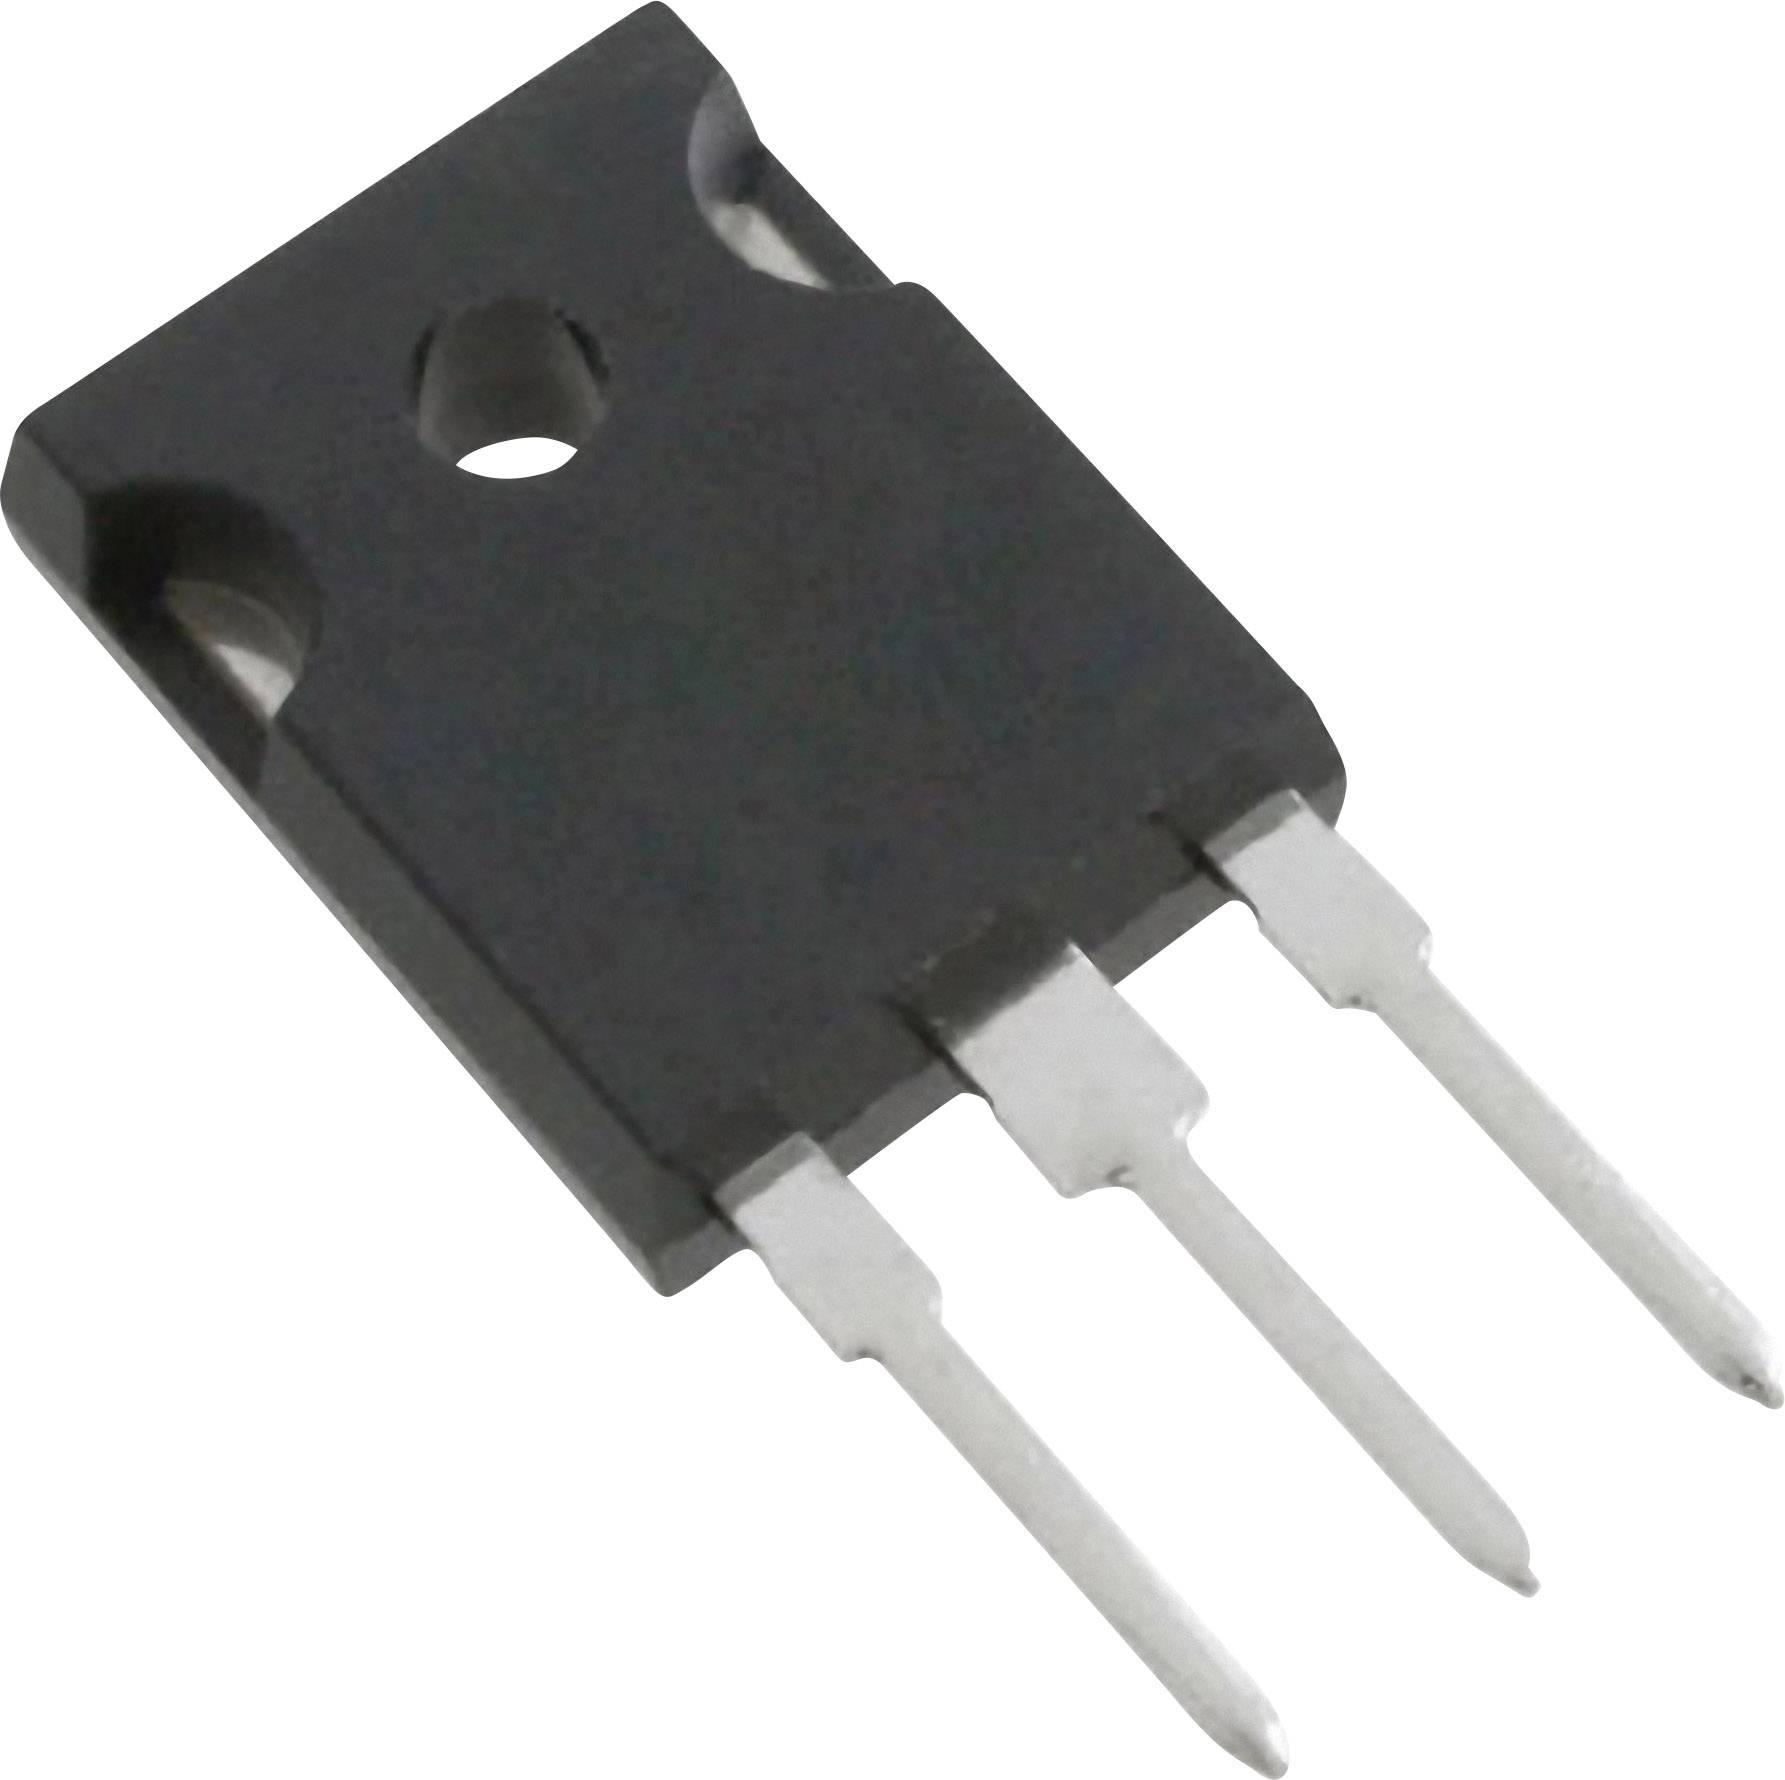 Tranzistor MOSFET Vishay IRFP360LC, TO-247, Kanálov 1, 400 V, 280 W